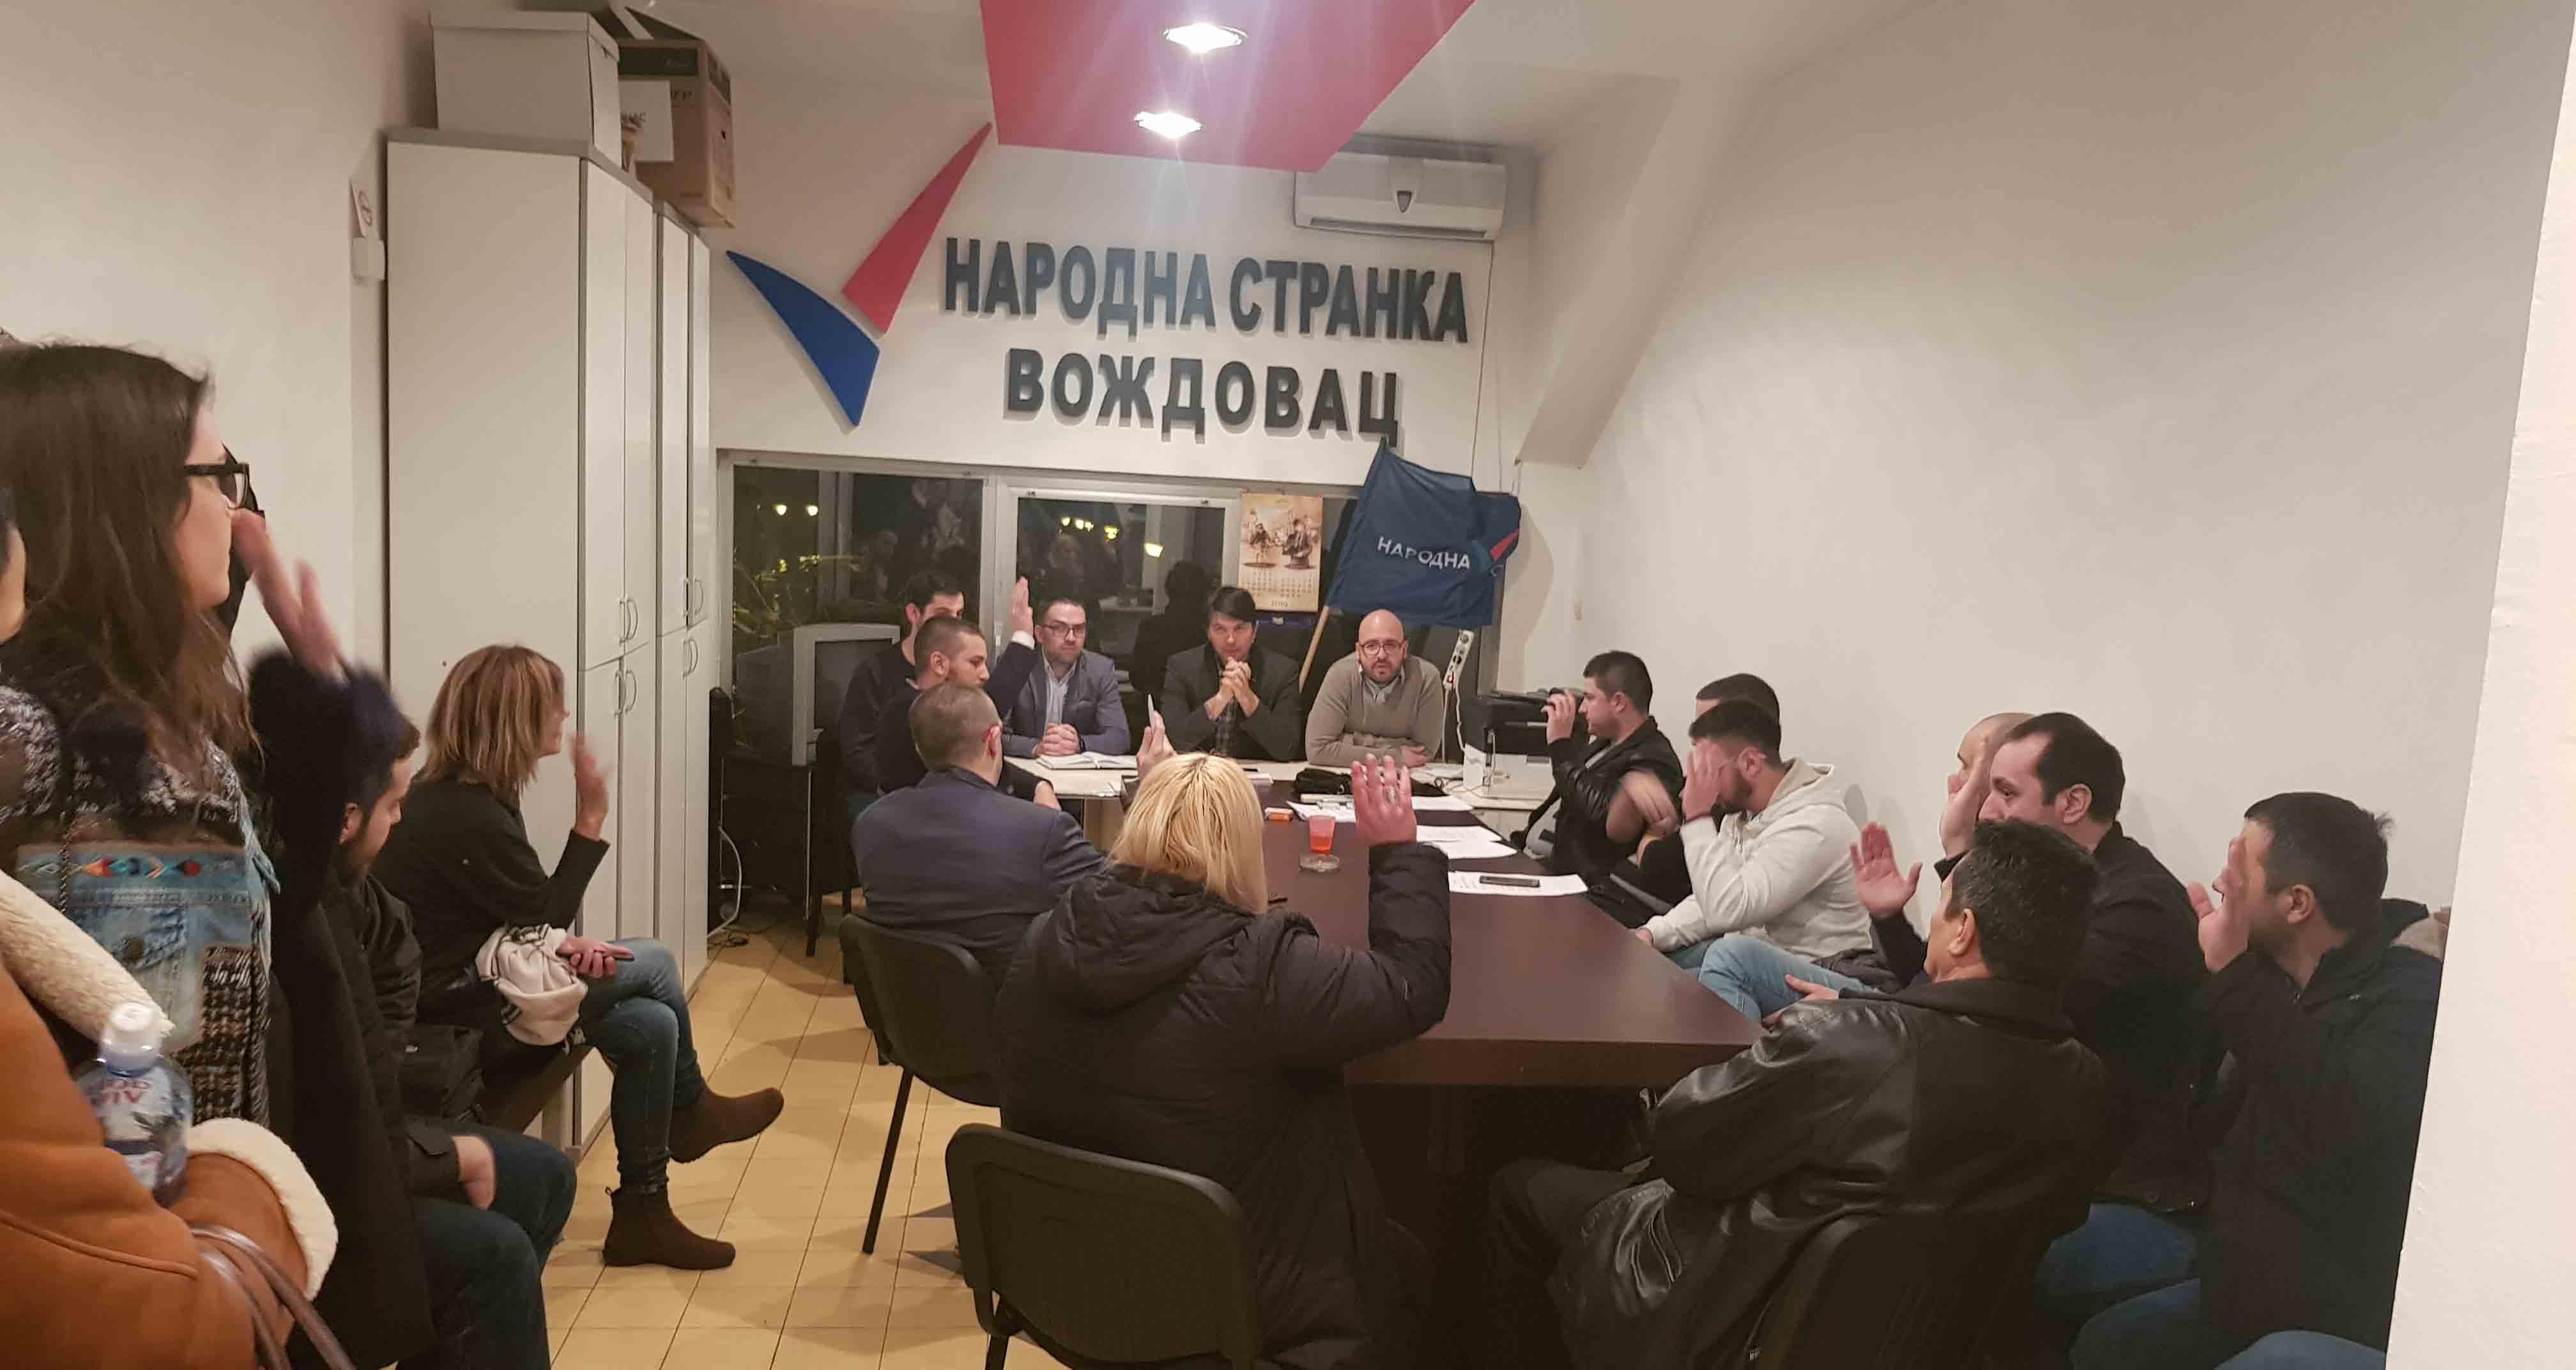 Народна странка Београд: Основан Месни одбор Кумодраж у општини Вождовац